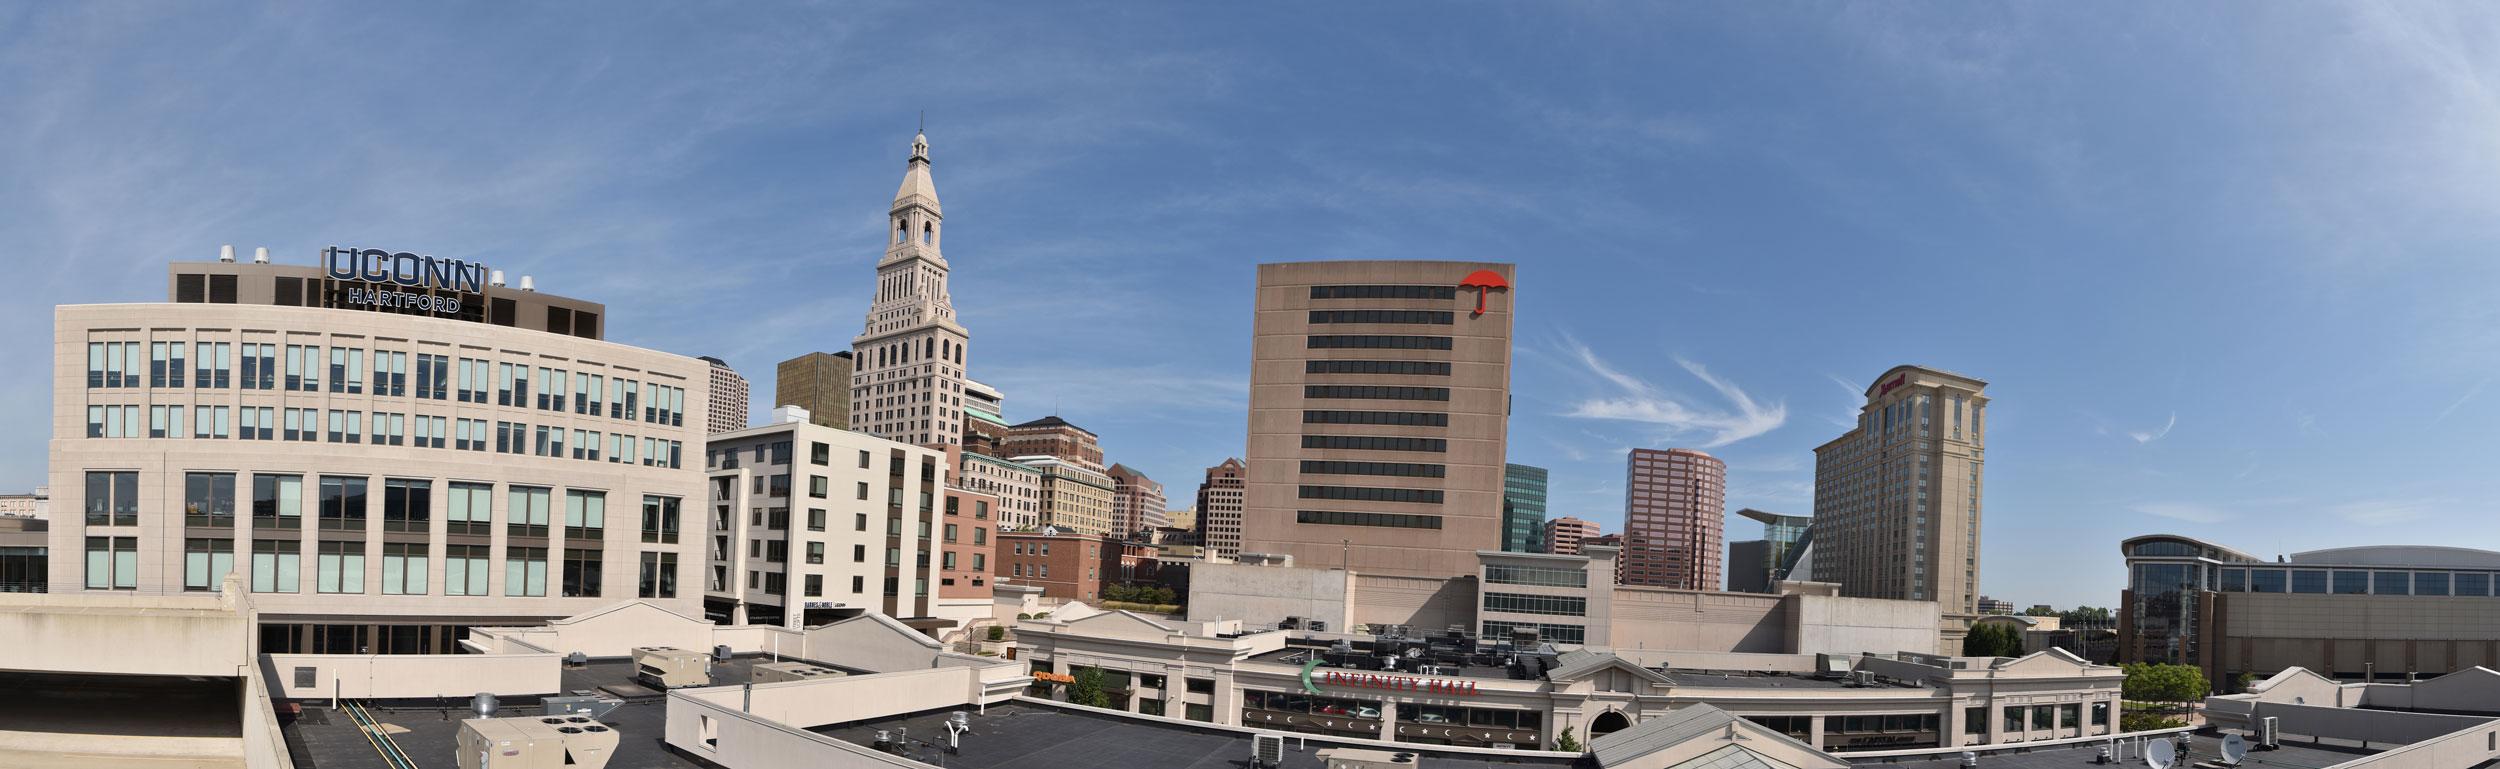 panoramic of city of Hartford